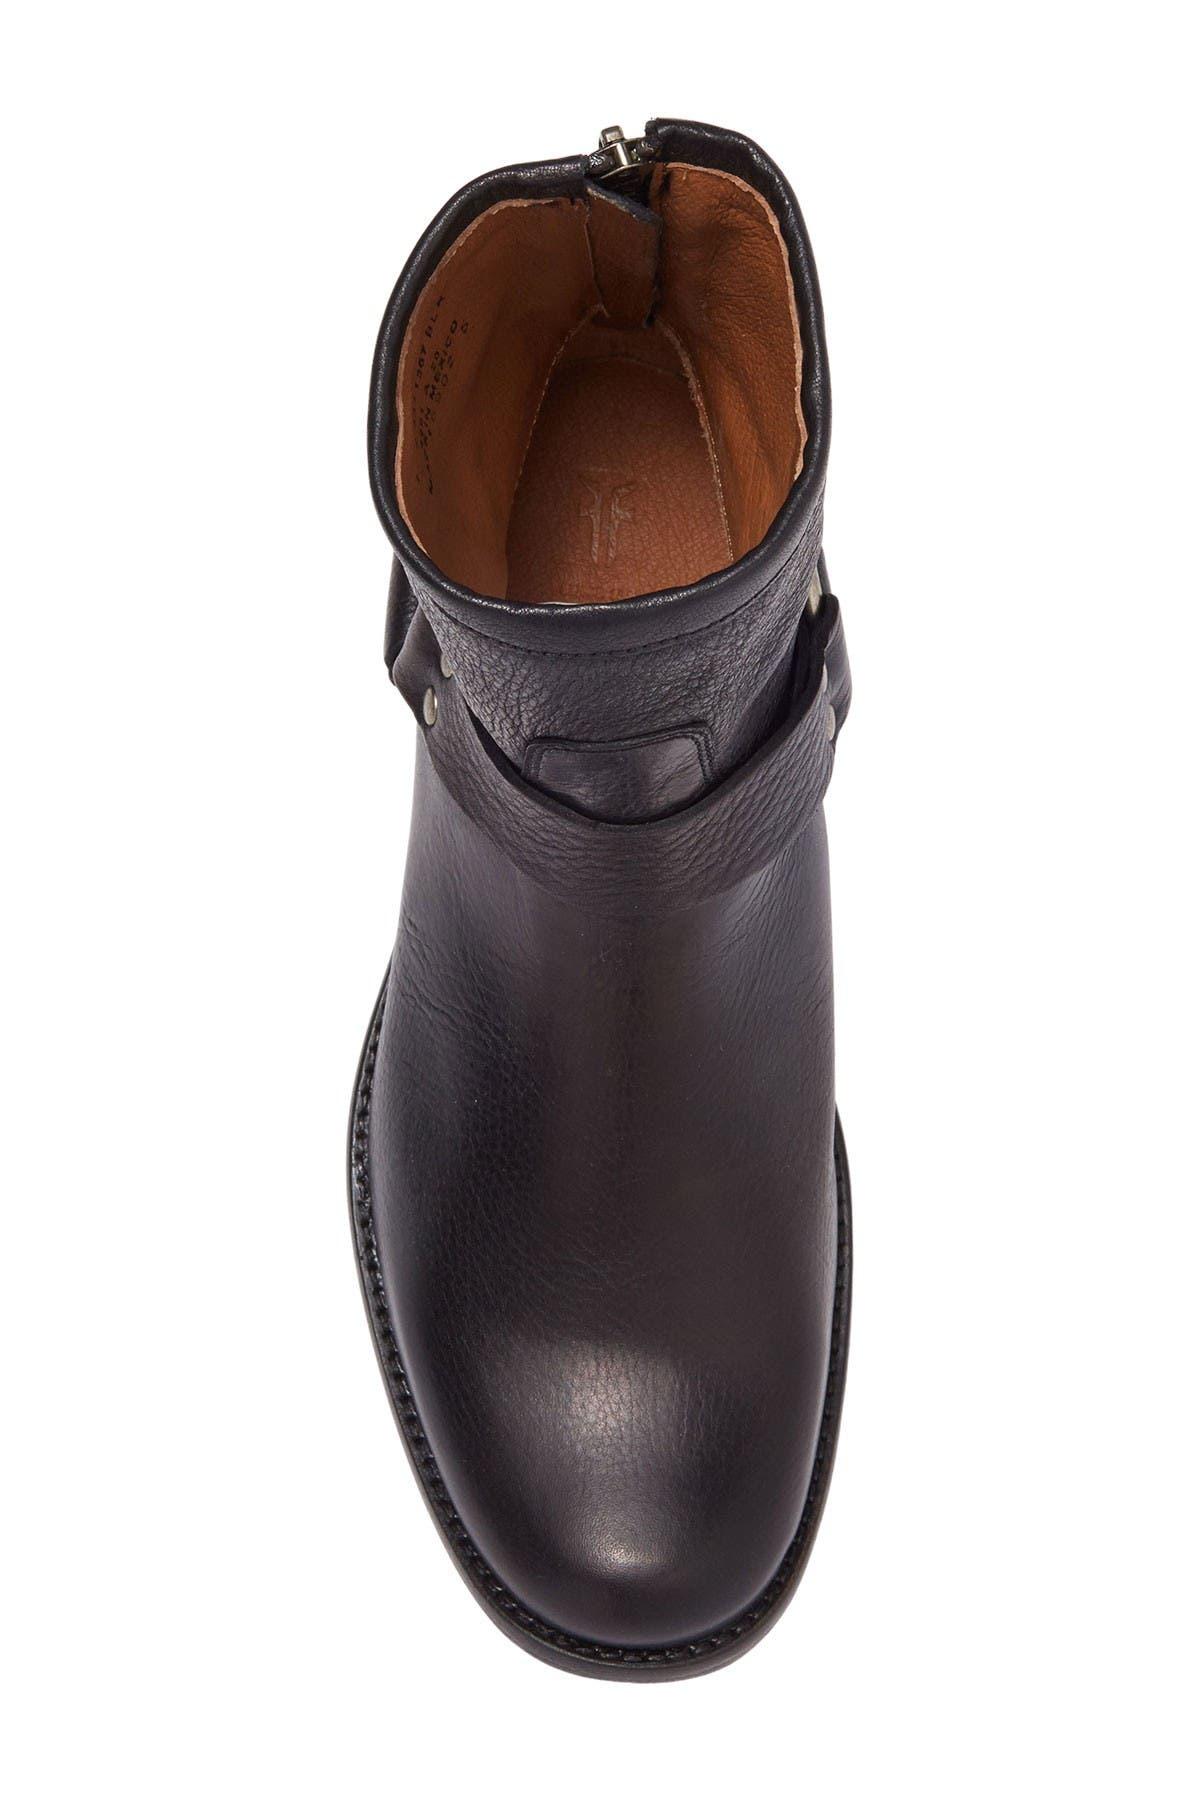 Frye Portia Harness Short Boot